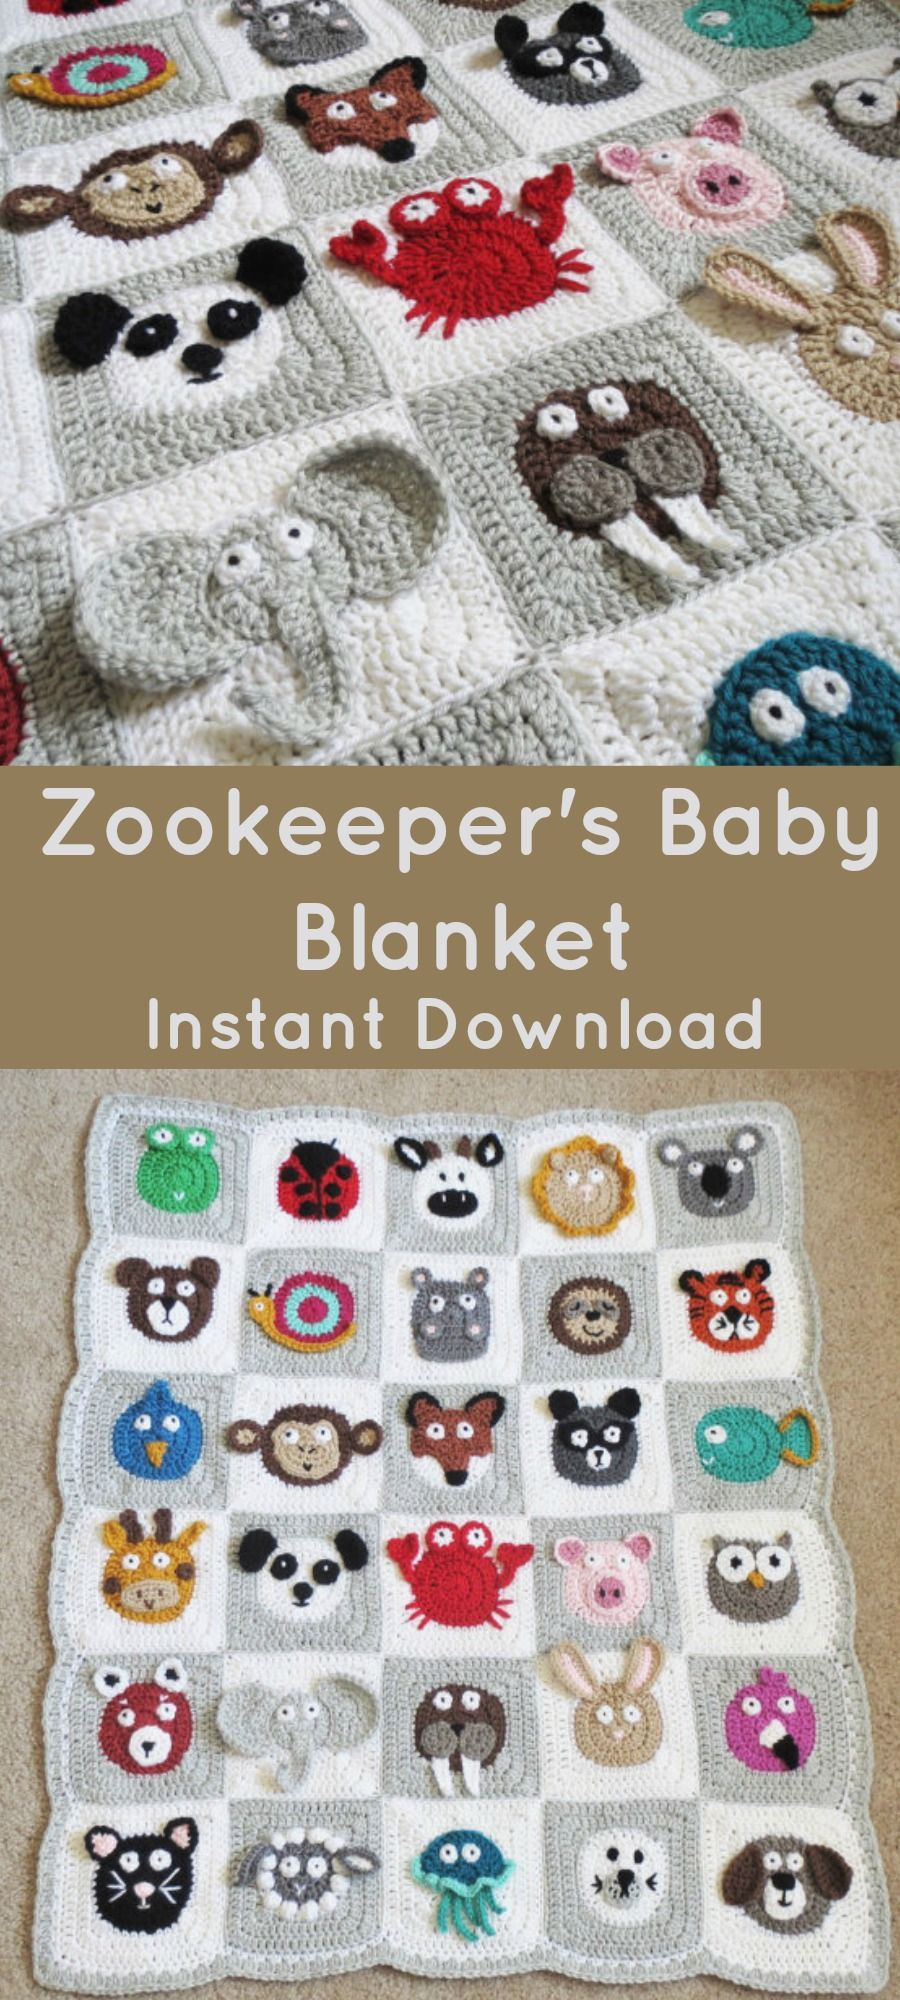 I Love This Crochet Baby Blanket Zookeepers Blanket Animal